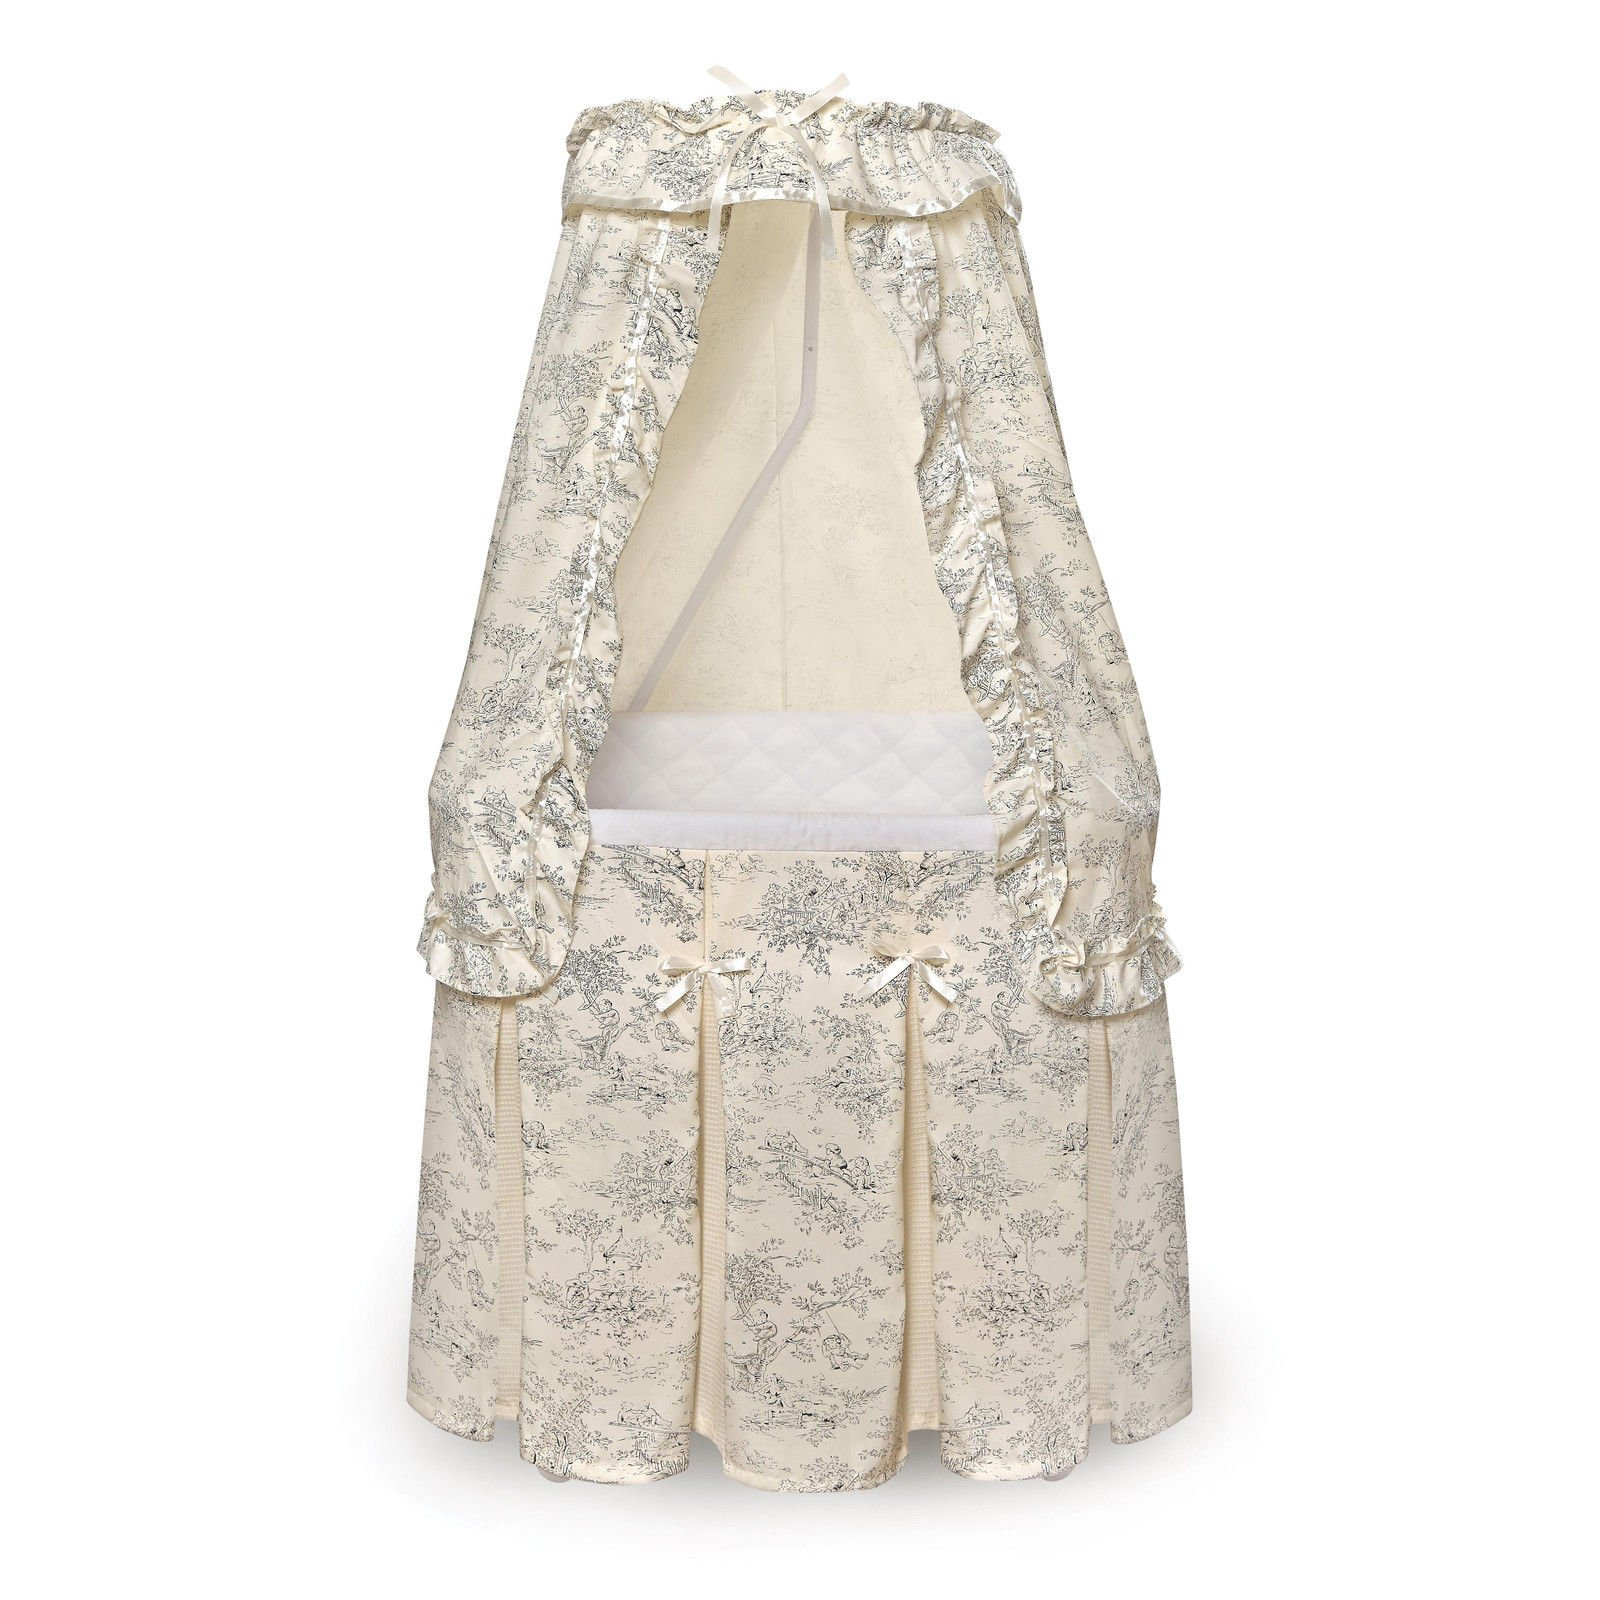 Durable Badger Basket Majesty Baby Bassinet with Canopy Black Toile Bedding by Badger Basket